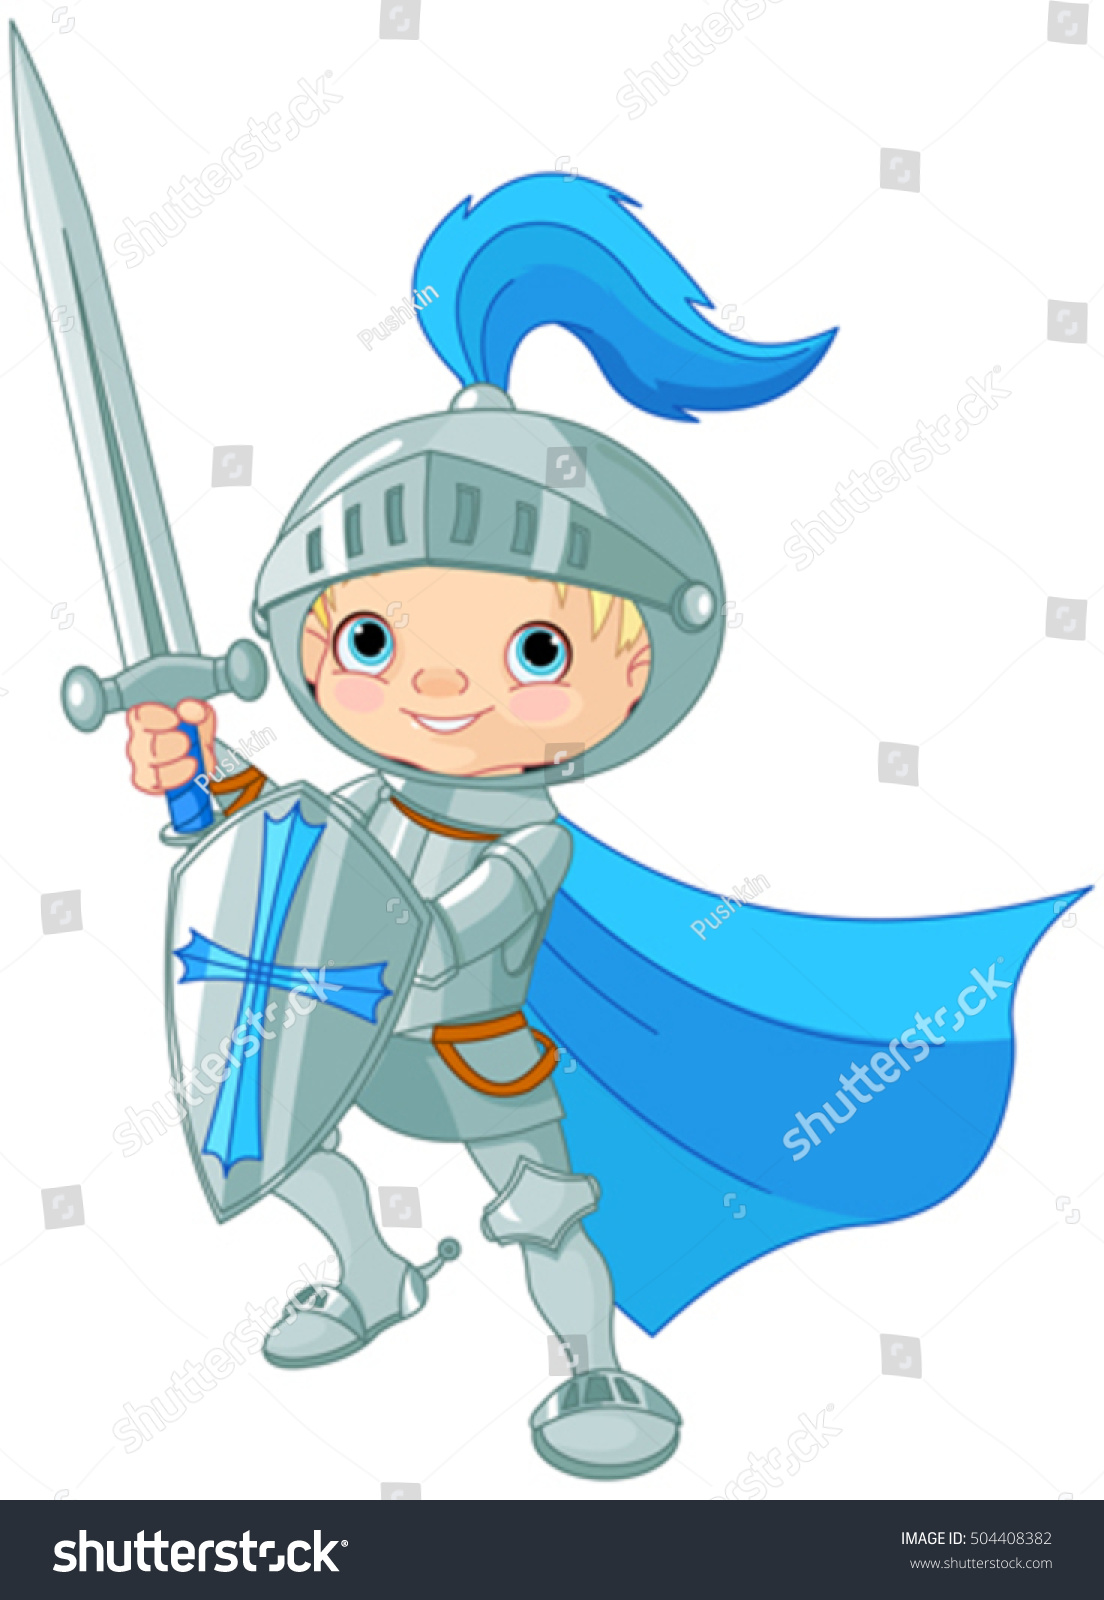 Illustration Fighting Brave Knight Stock Vector 504408382 ...